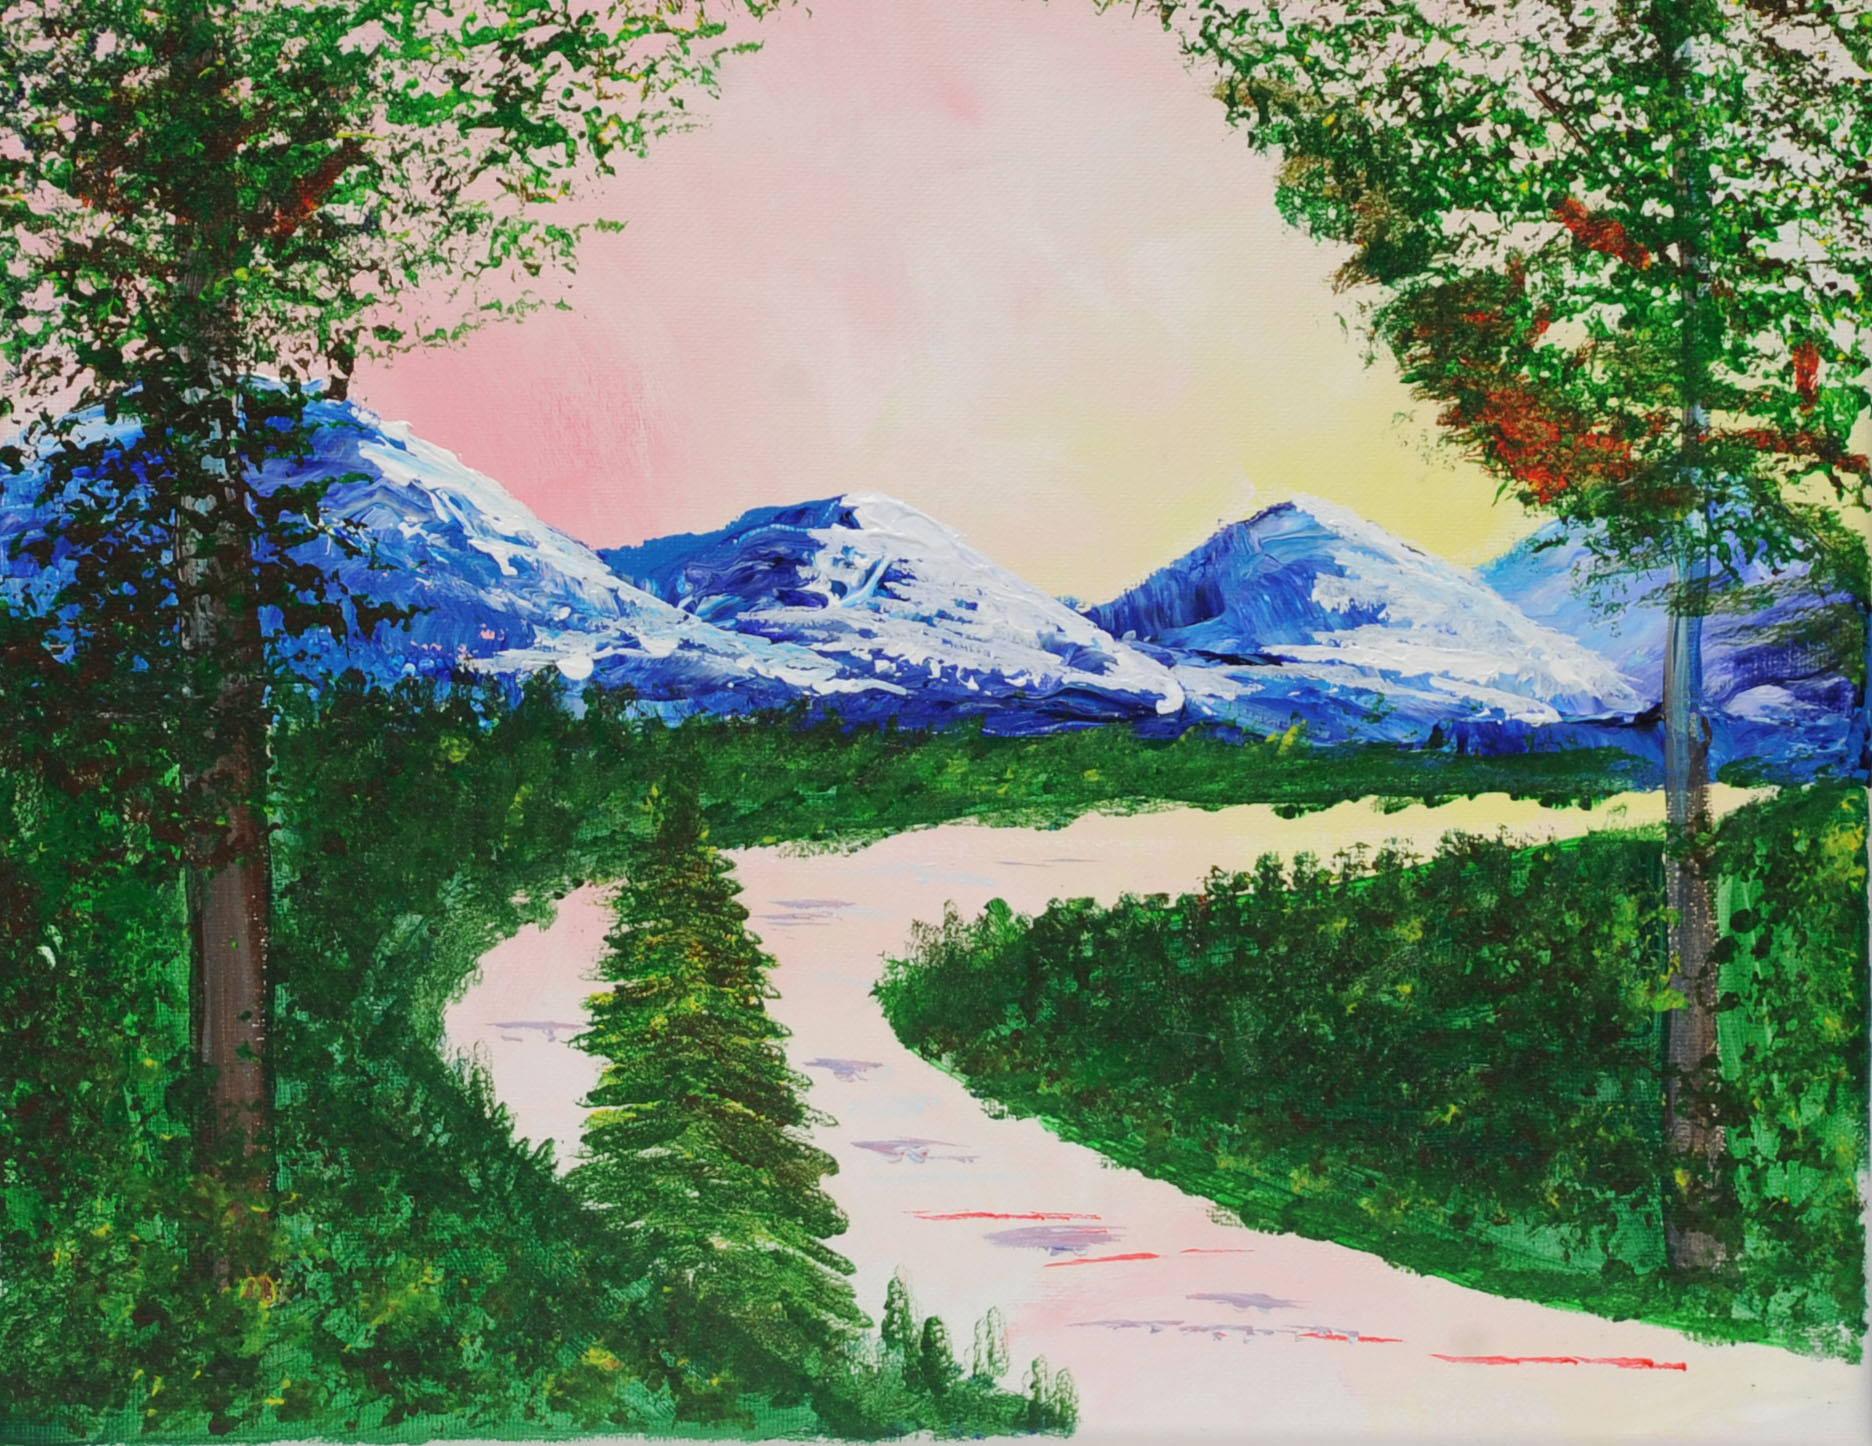 Rossy Mountain Peaks Paint & Sip Kit